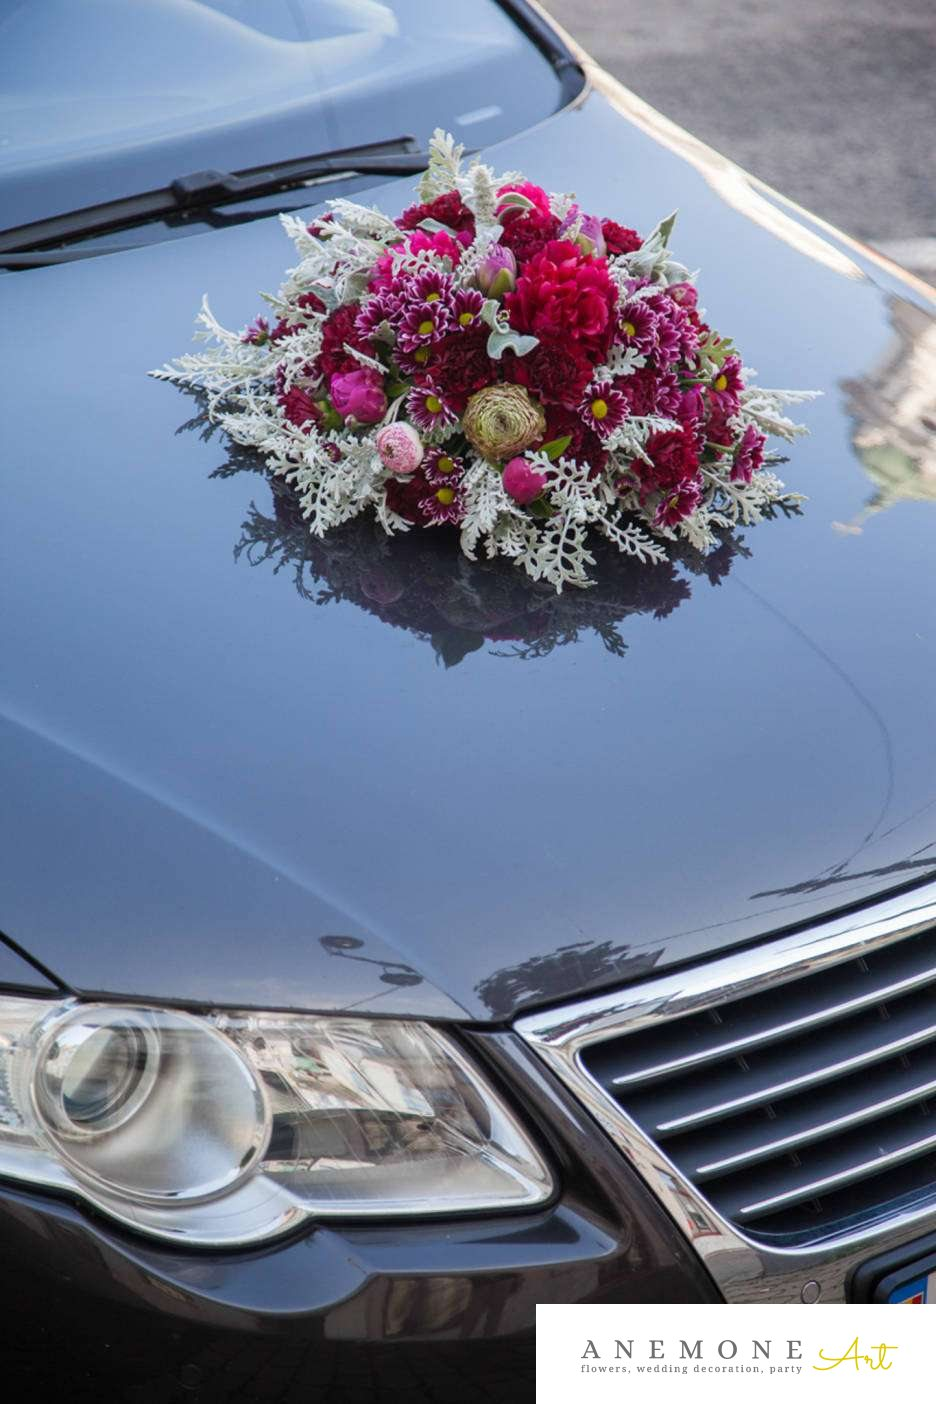 Poza, foto cu Flori de nunta bujori, crizanteme, decor masina, ranunculus, trandafiri englezesti, visiniu in Arad, Timisoara, Oradea (wedding flowers, bouquets) nunta Arad, Timisoara, Oradea